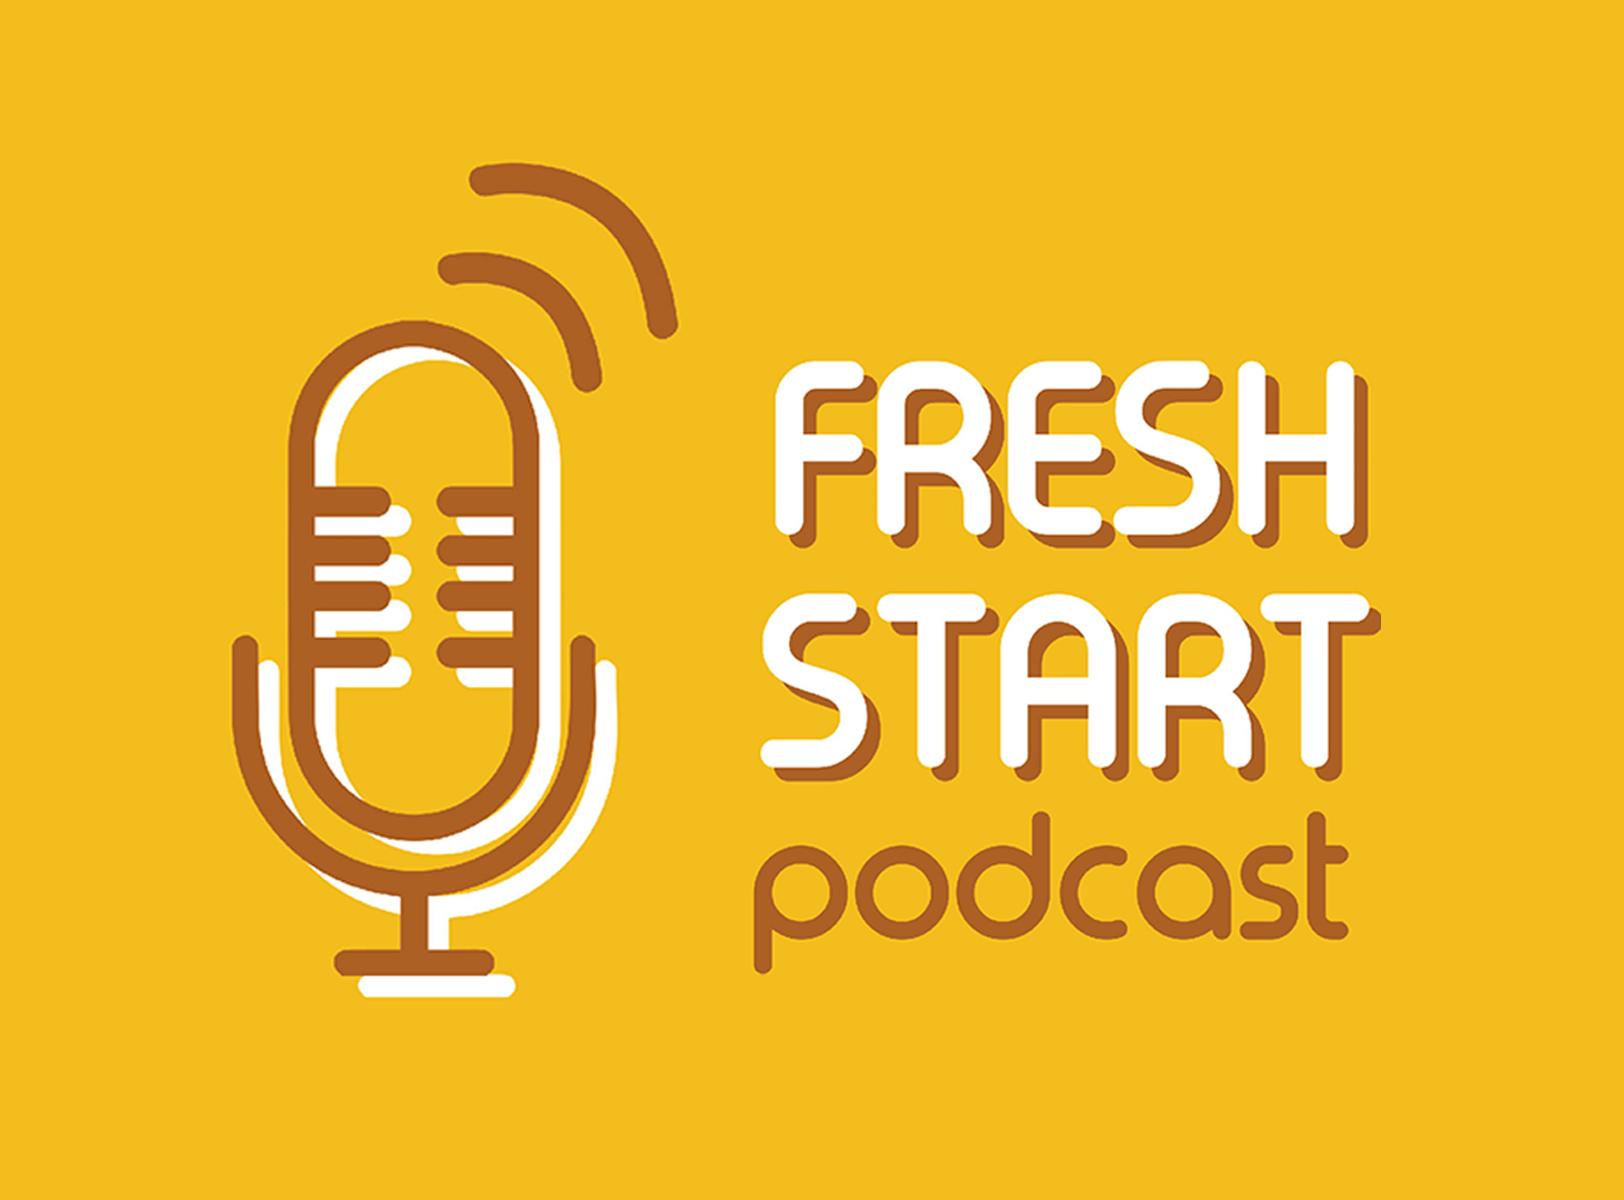 Fresh Start: Podcast News (5/17/2019 Fri.)